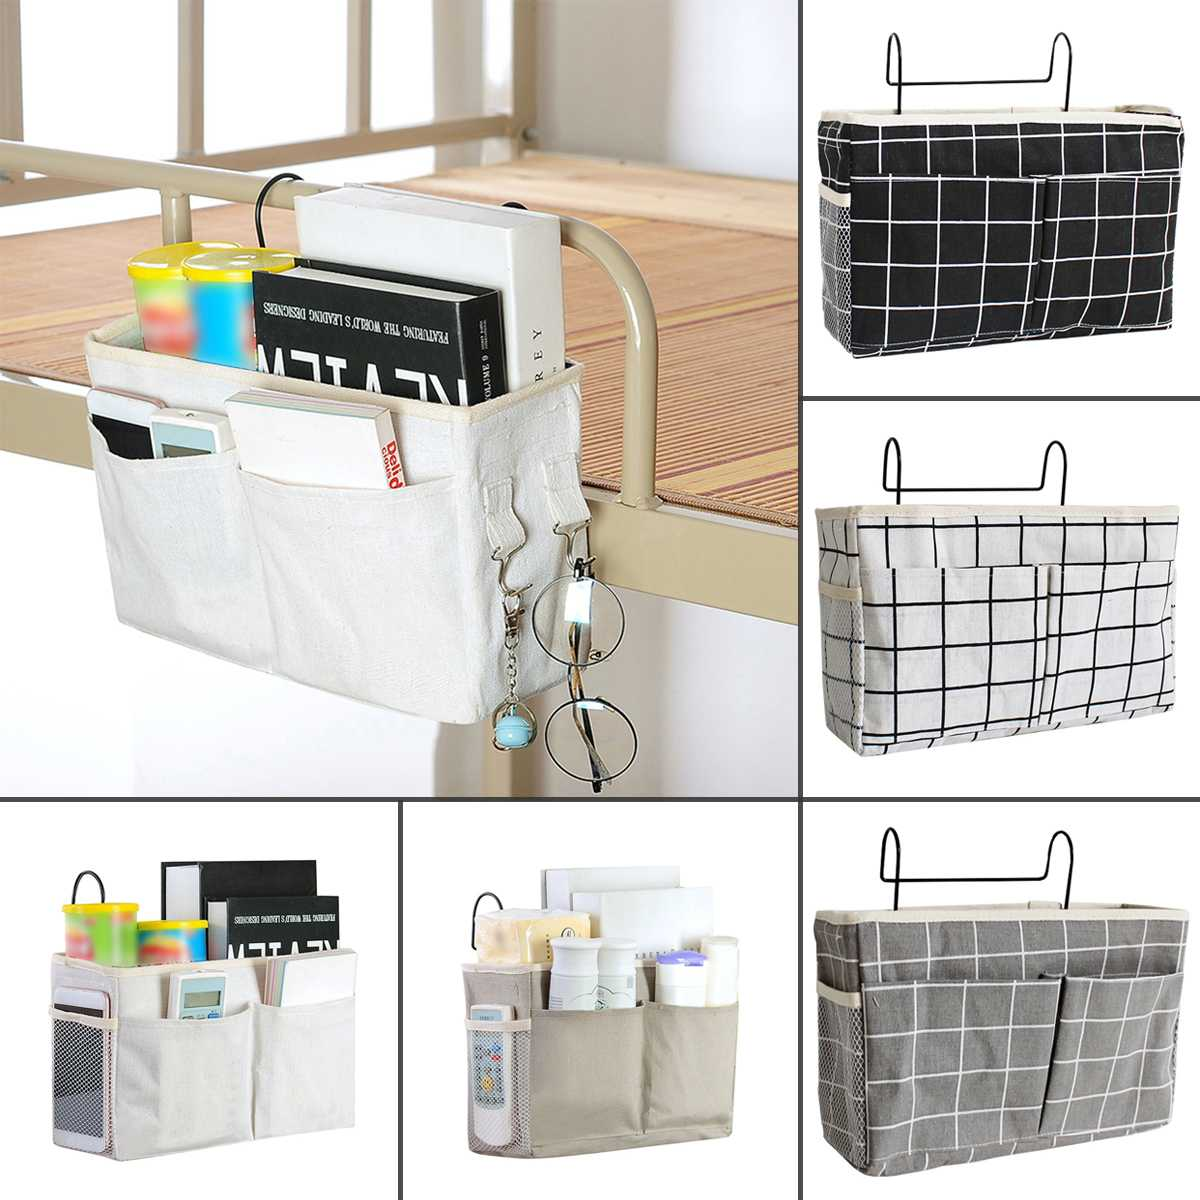 Bedside Storage Organizer Dorm Room Phone Book Magazine Storage Bag Holder With Hook Remote Caddy Bunk Bed Pocket Save Space|Hanging Organizers| |  - title=